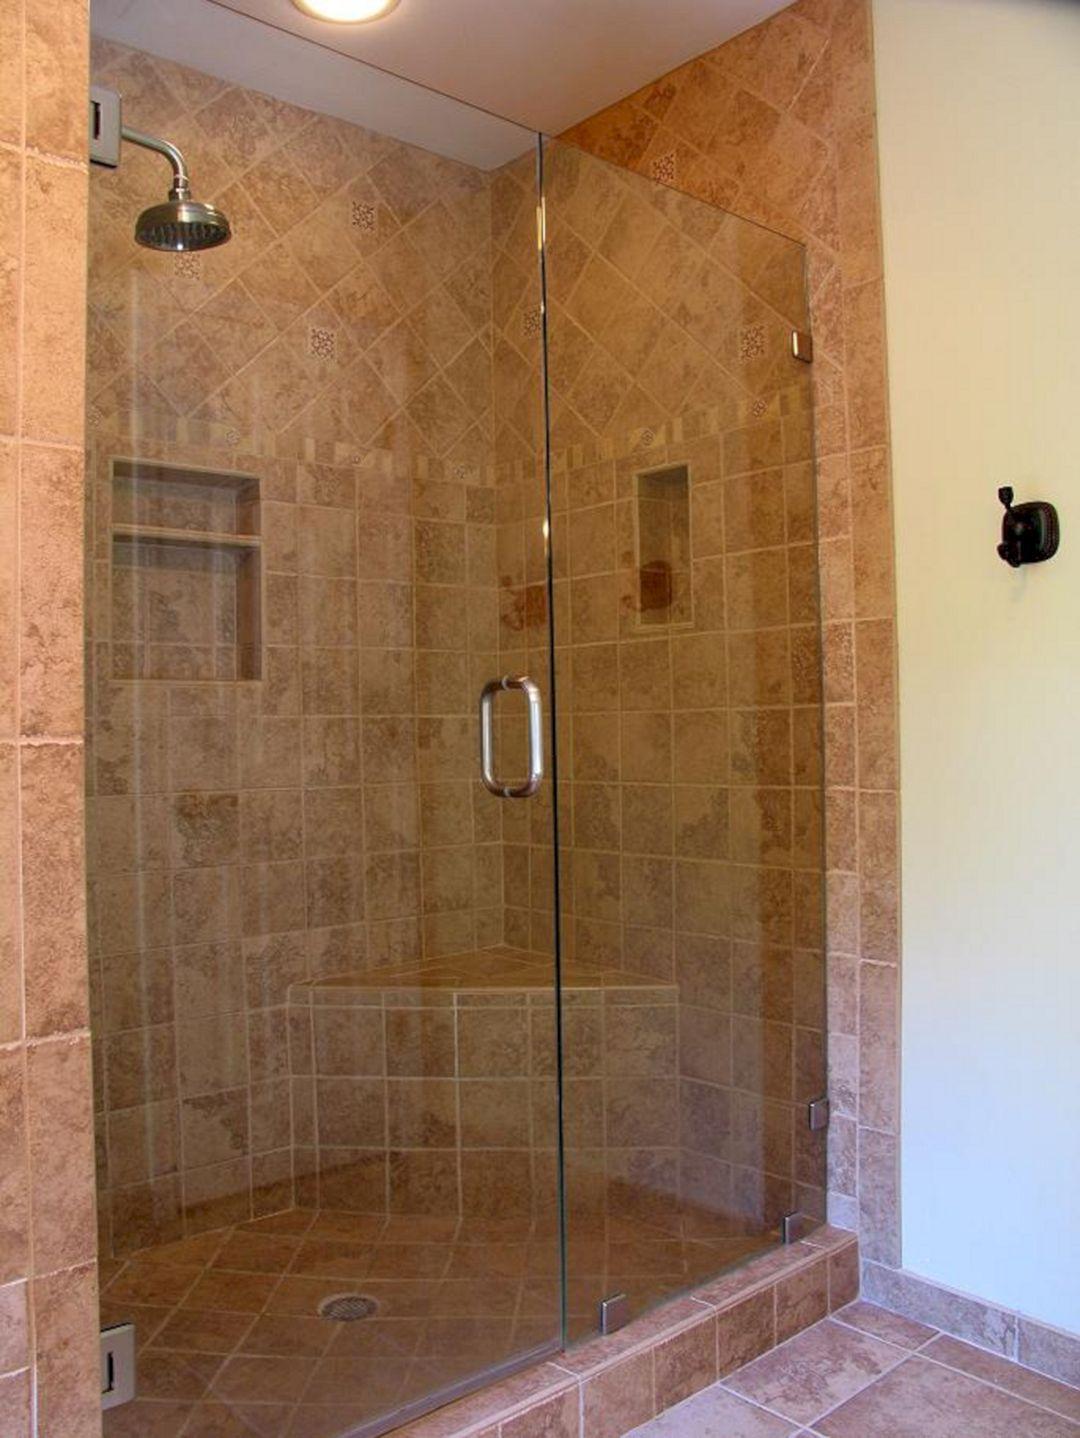 Great Idea 20 Awesome Shower Design Ideas For Small Bathroom Https Decoredo Com 20905 20 Awesome Shower Bathroom Design Bathrooms Remodel Tile Walk In Shower